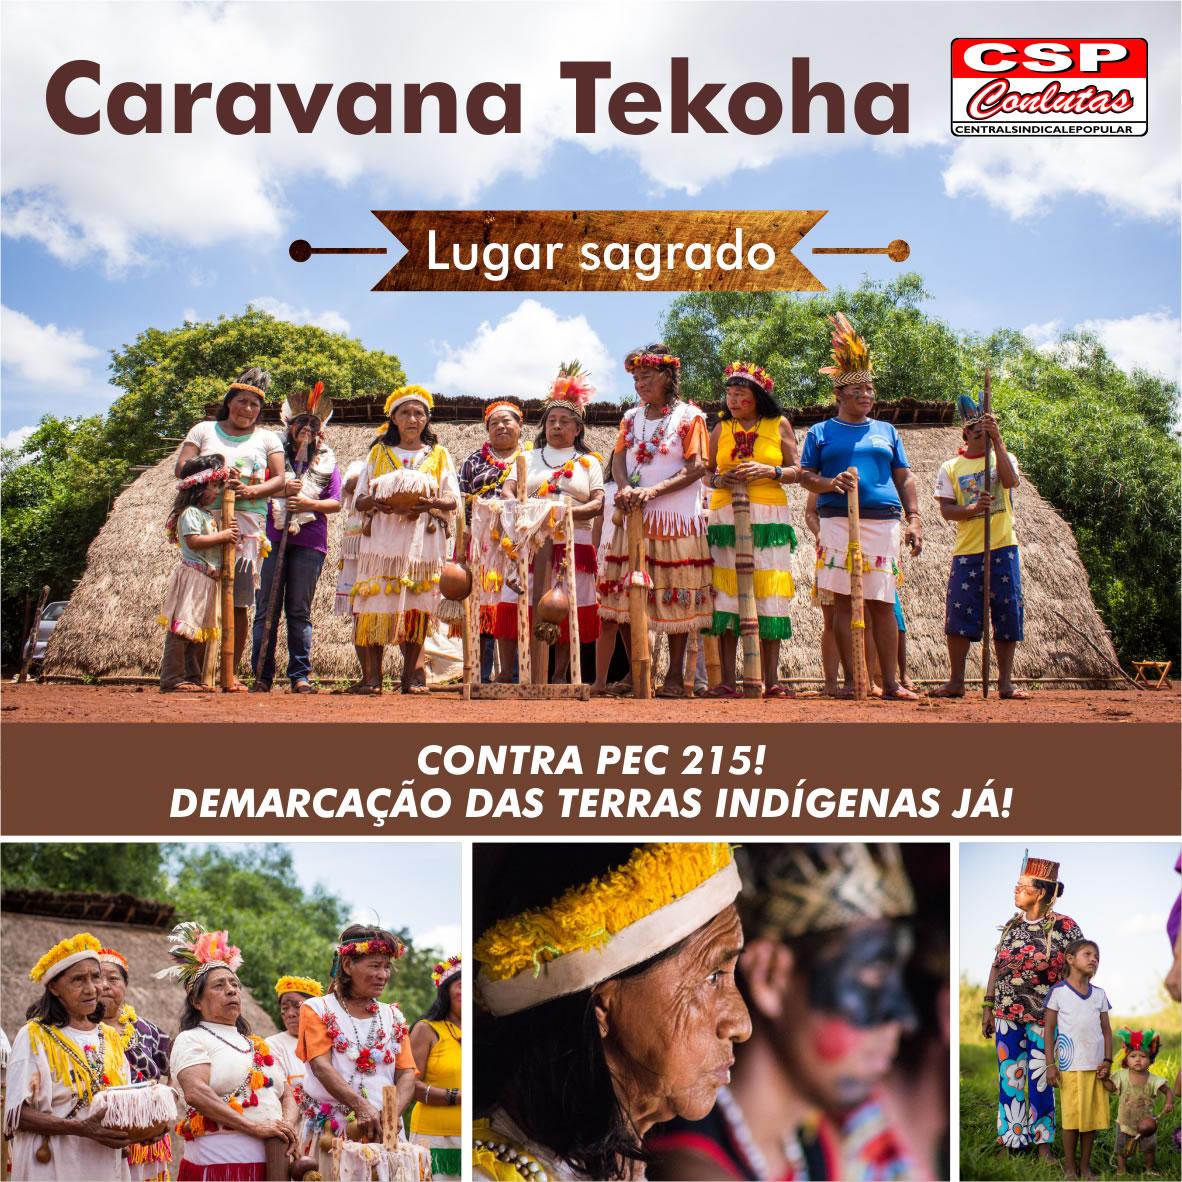 CSP-Conlutas organiza caravana a MS em solidariedade aos povos Guarani Kaiowa